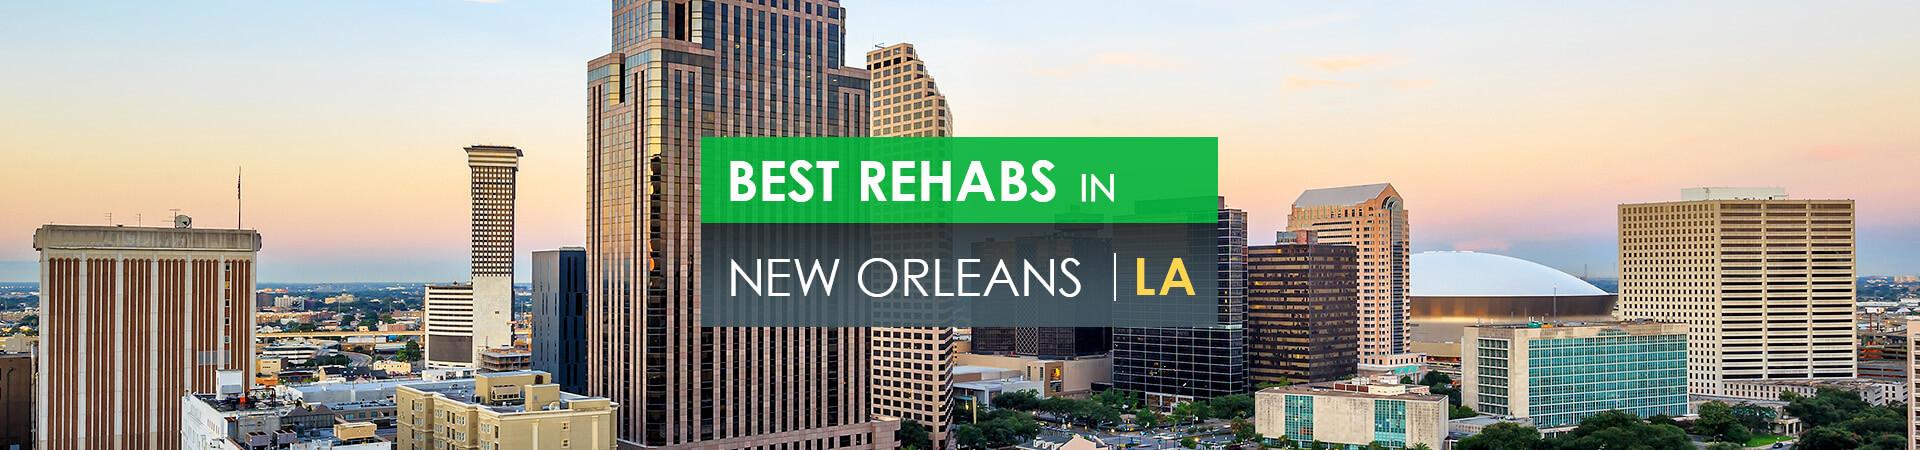 Best rehabs in New Orleans, LA